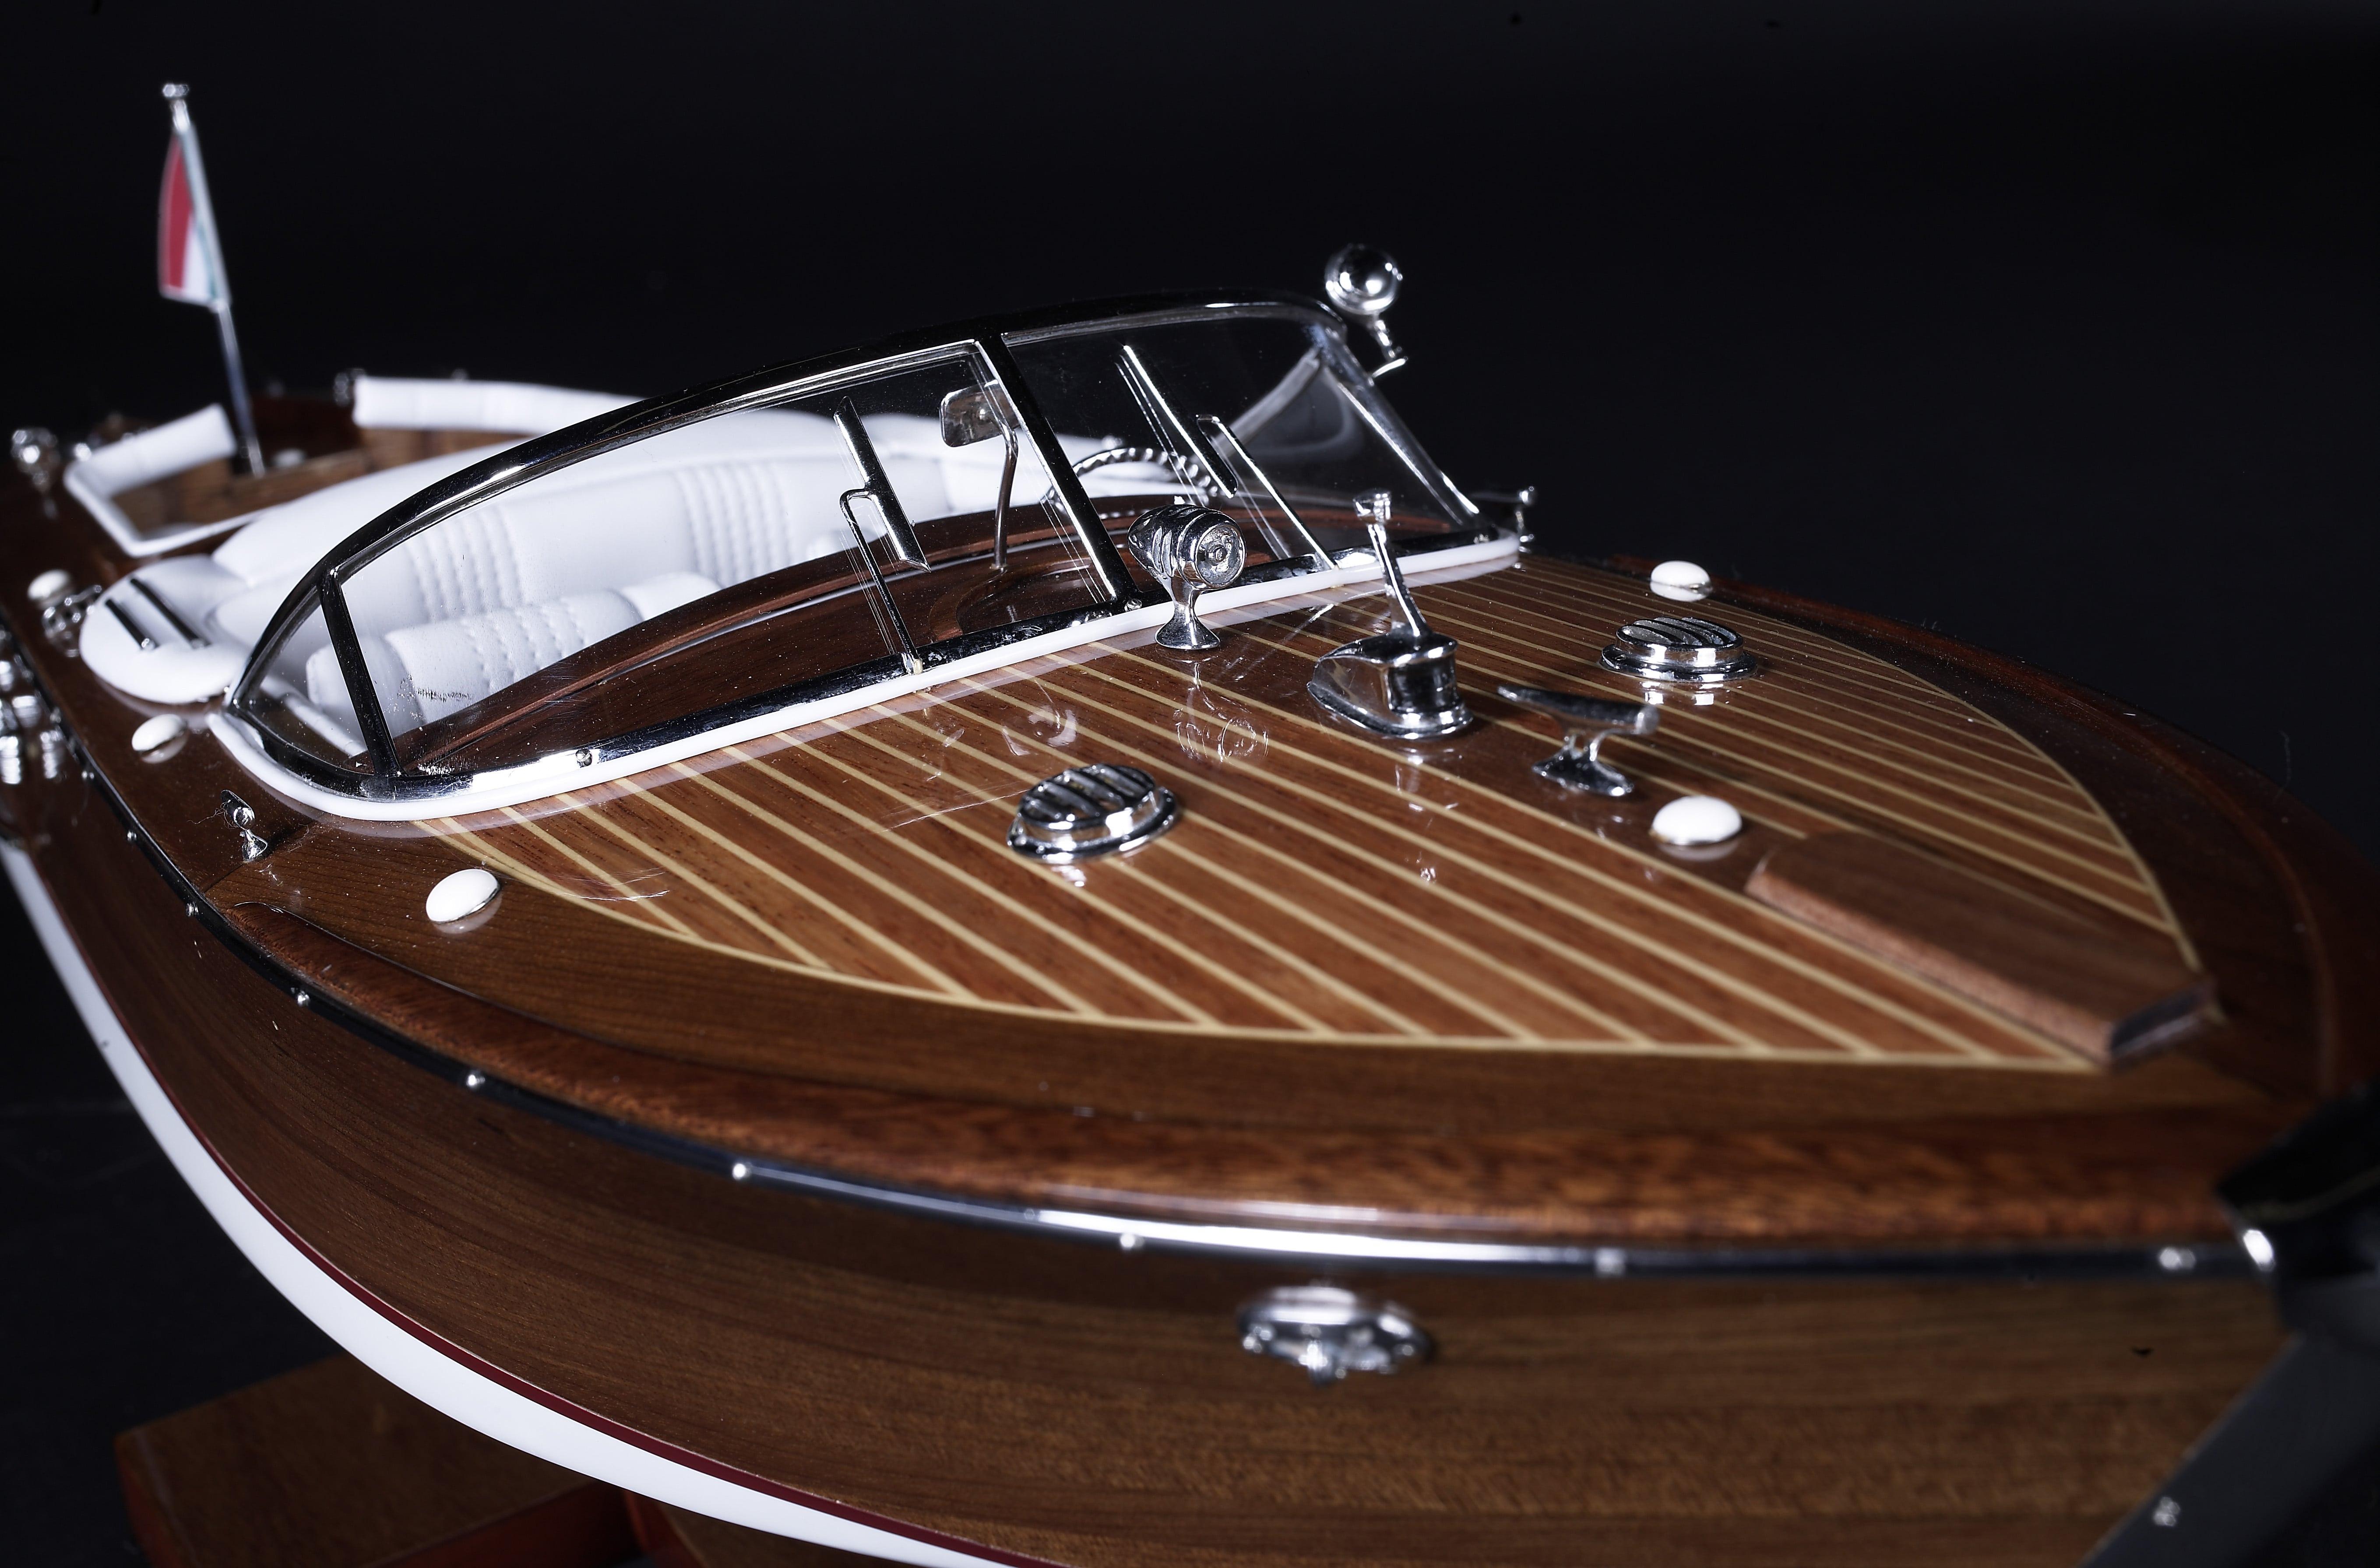 Riva Aquarama Model Boat (Standard Range) - Authentic Models (AS182)